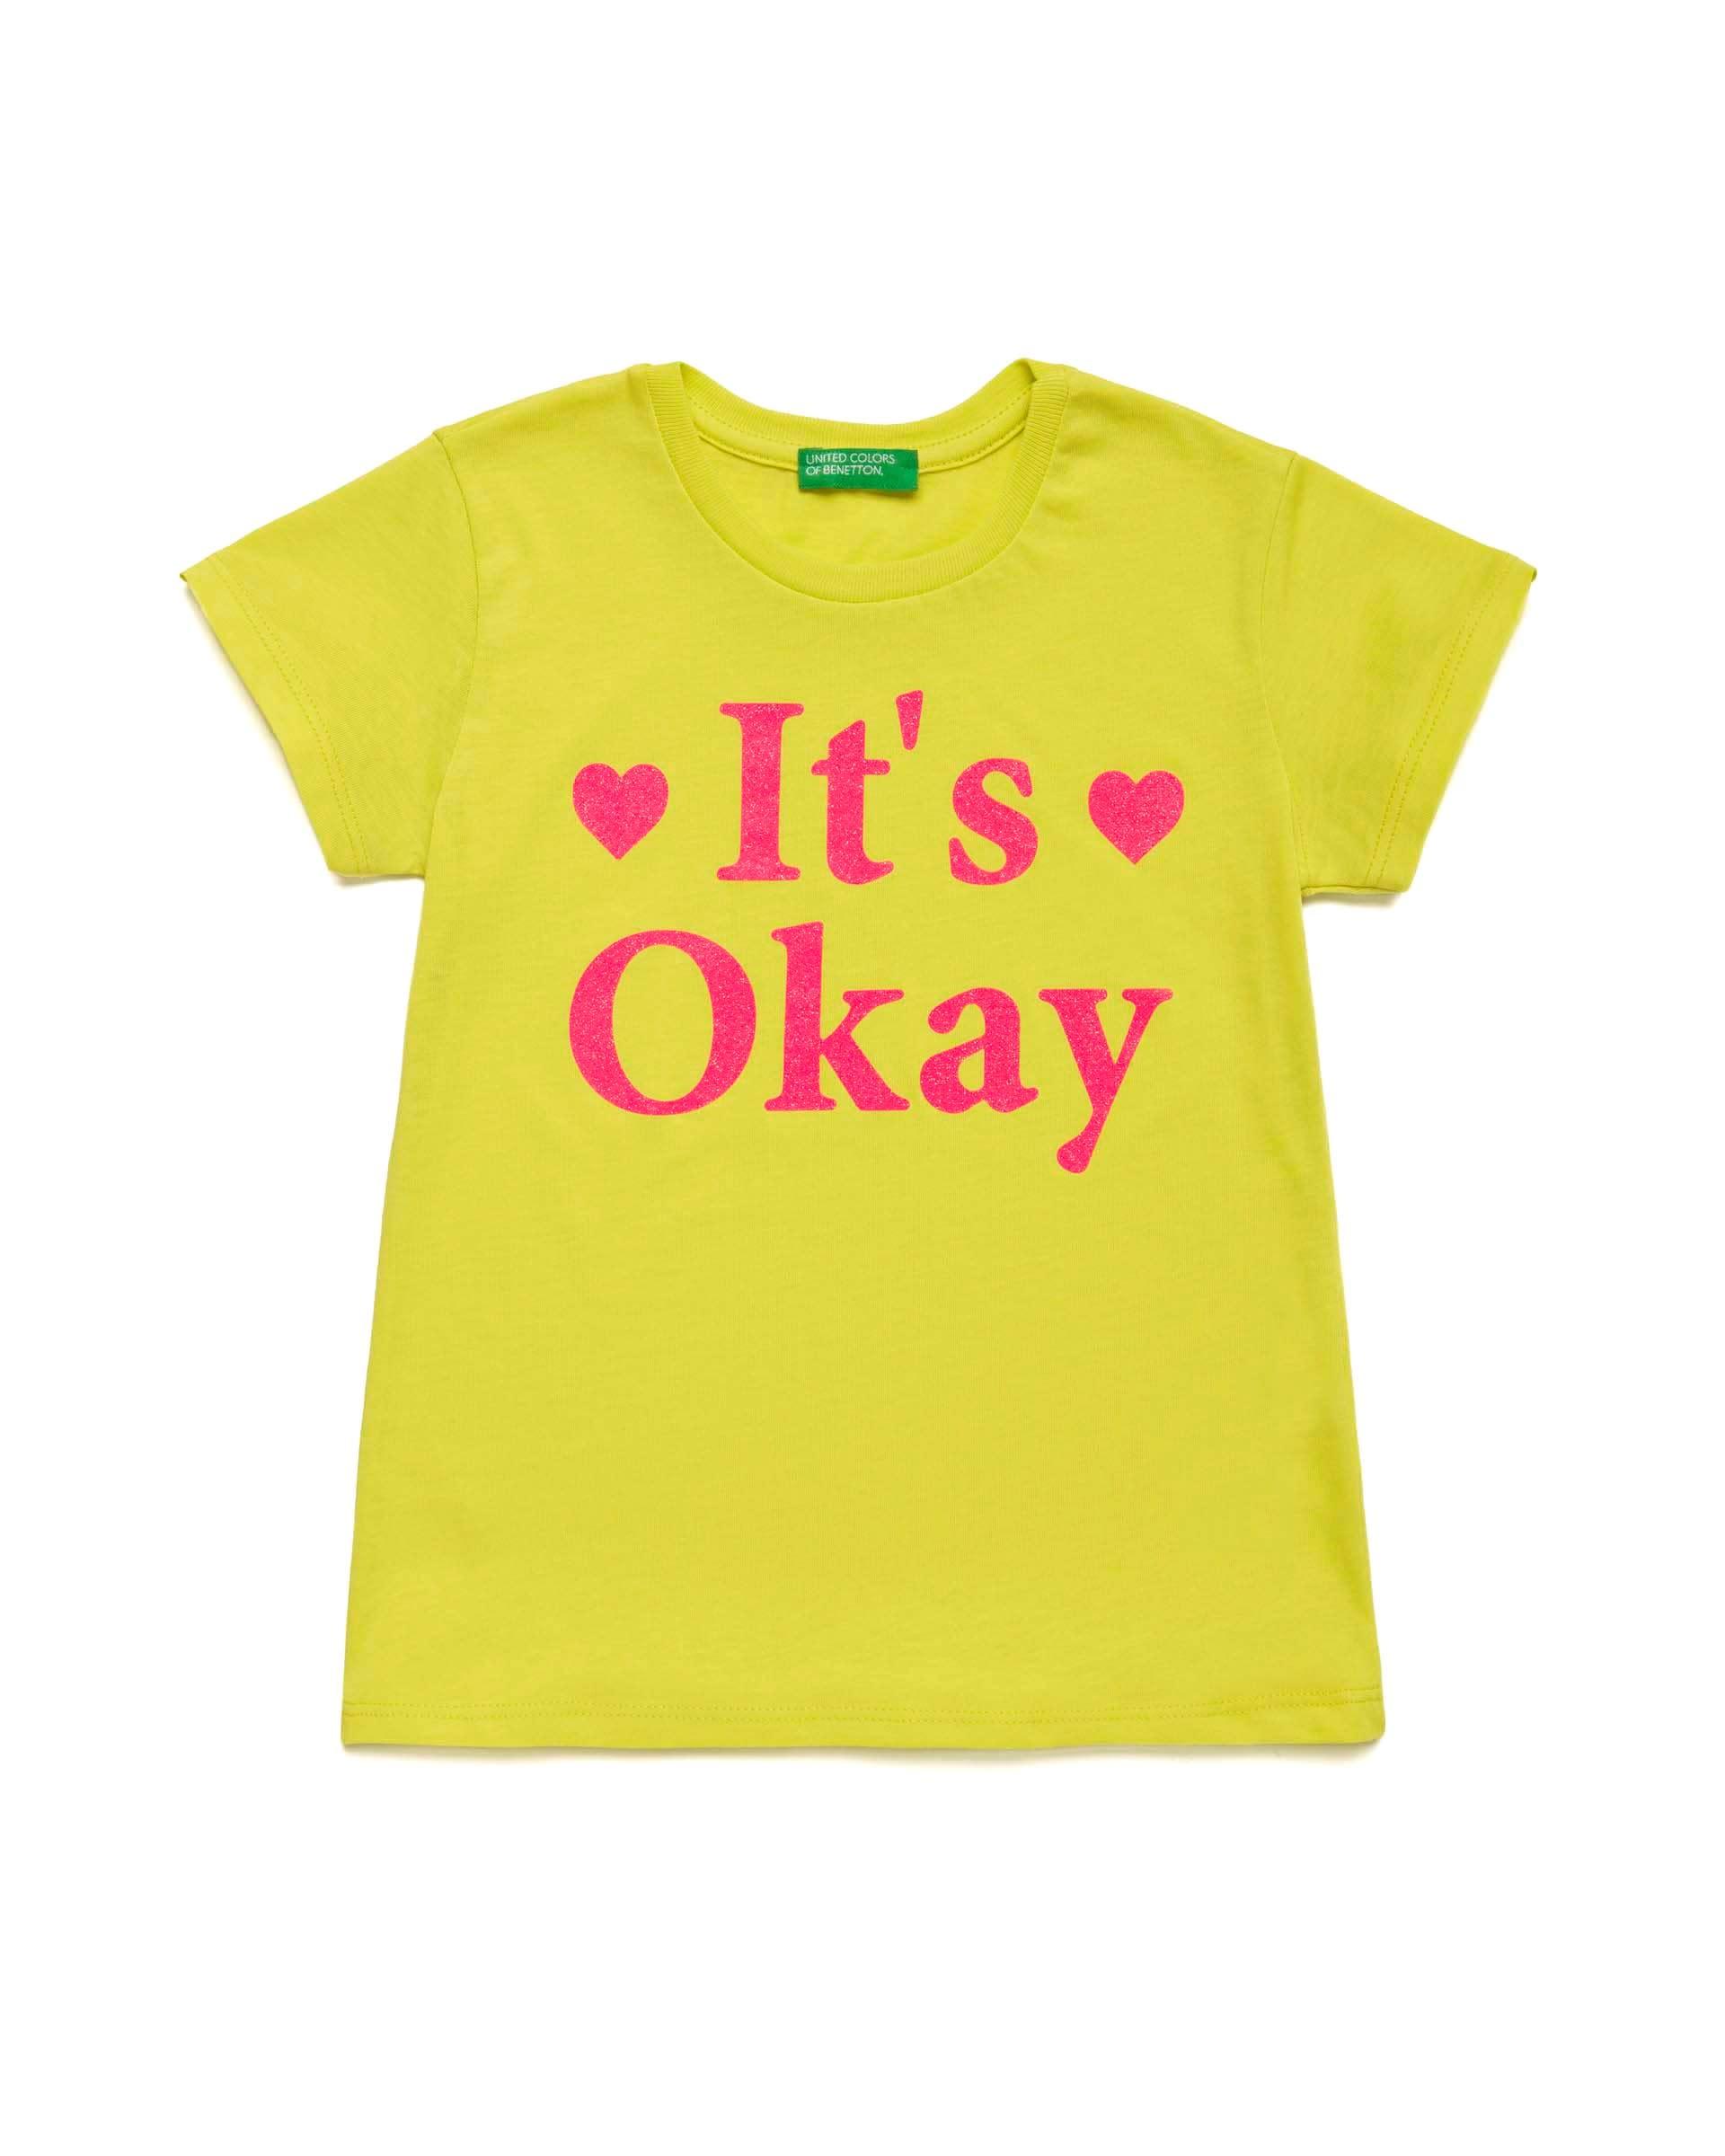 Купить 20P_3I1XC14KM_28M, Футболка для девочек Benetton 3I1XC14KM_28M р-р 122, United Colors of Benetton, Футболки для девочек